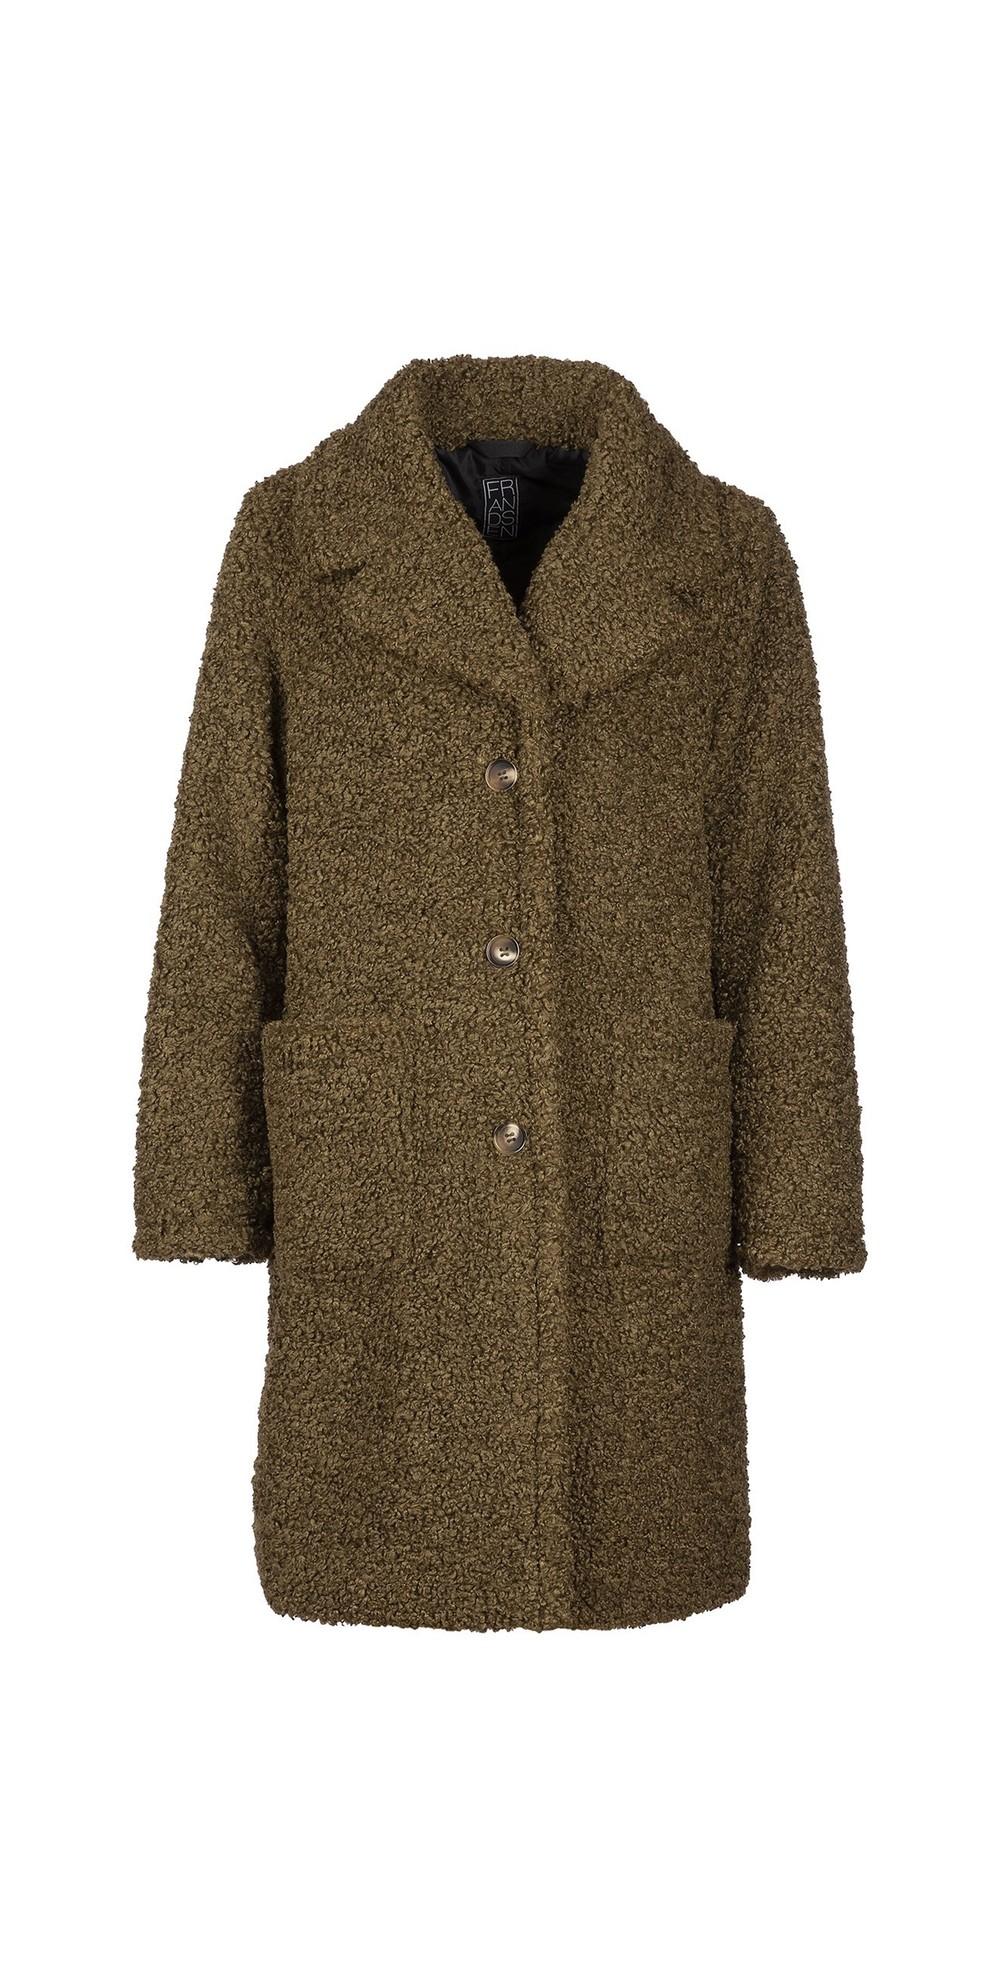 Teddy Coat main image